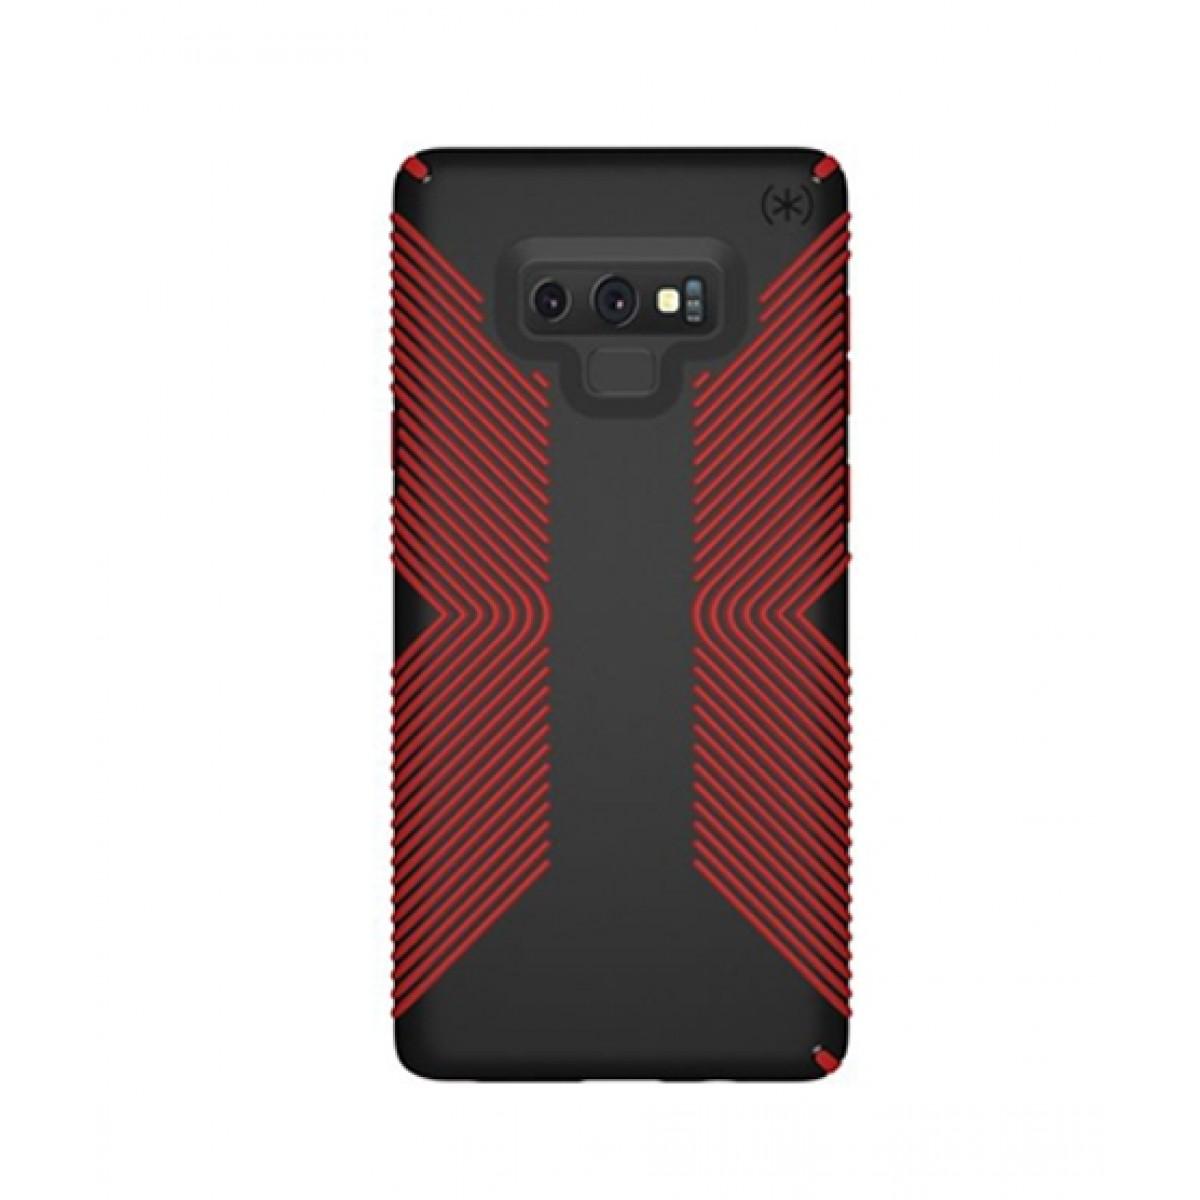 reputable site f2932 4decc Speck Presidio Grip Black/Dark Poppy Red Case For Galaxy Note 9